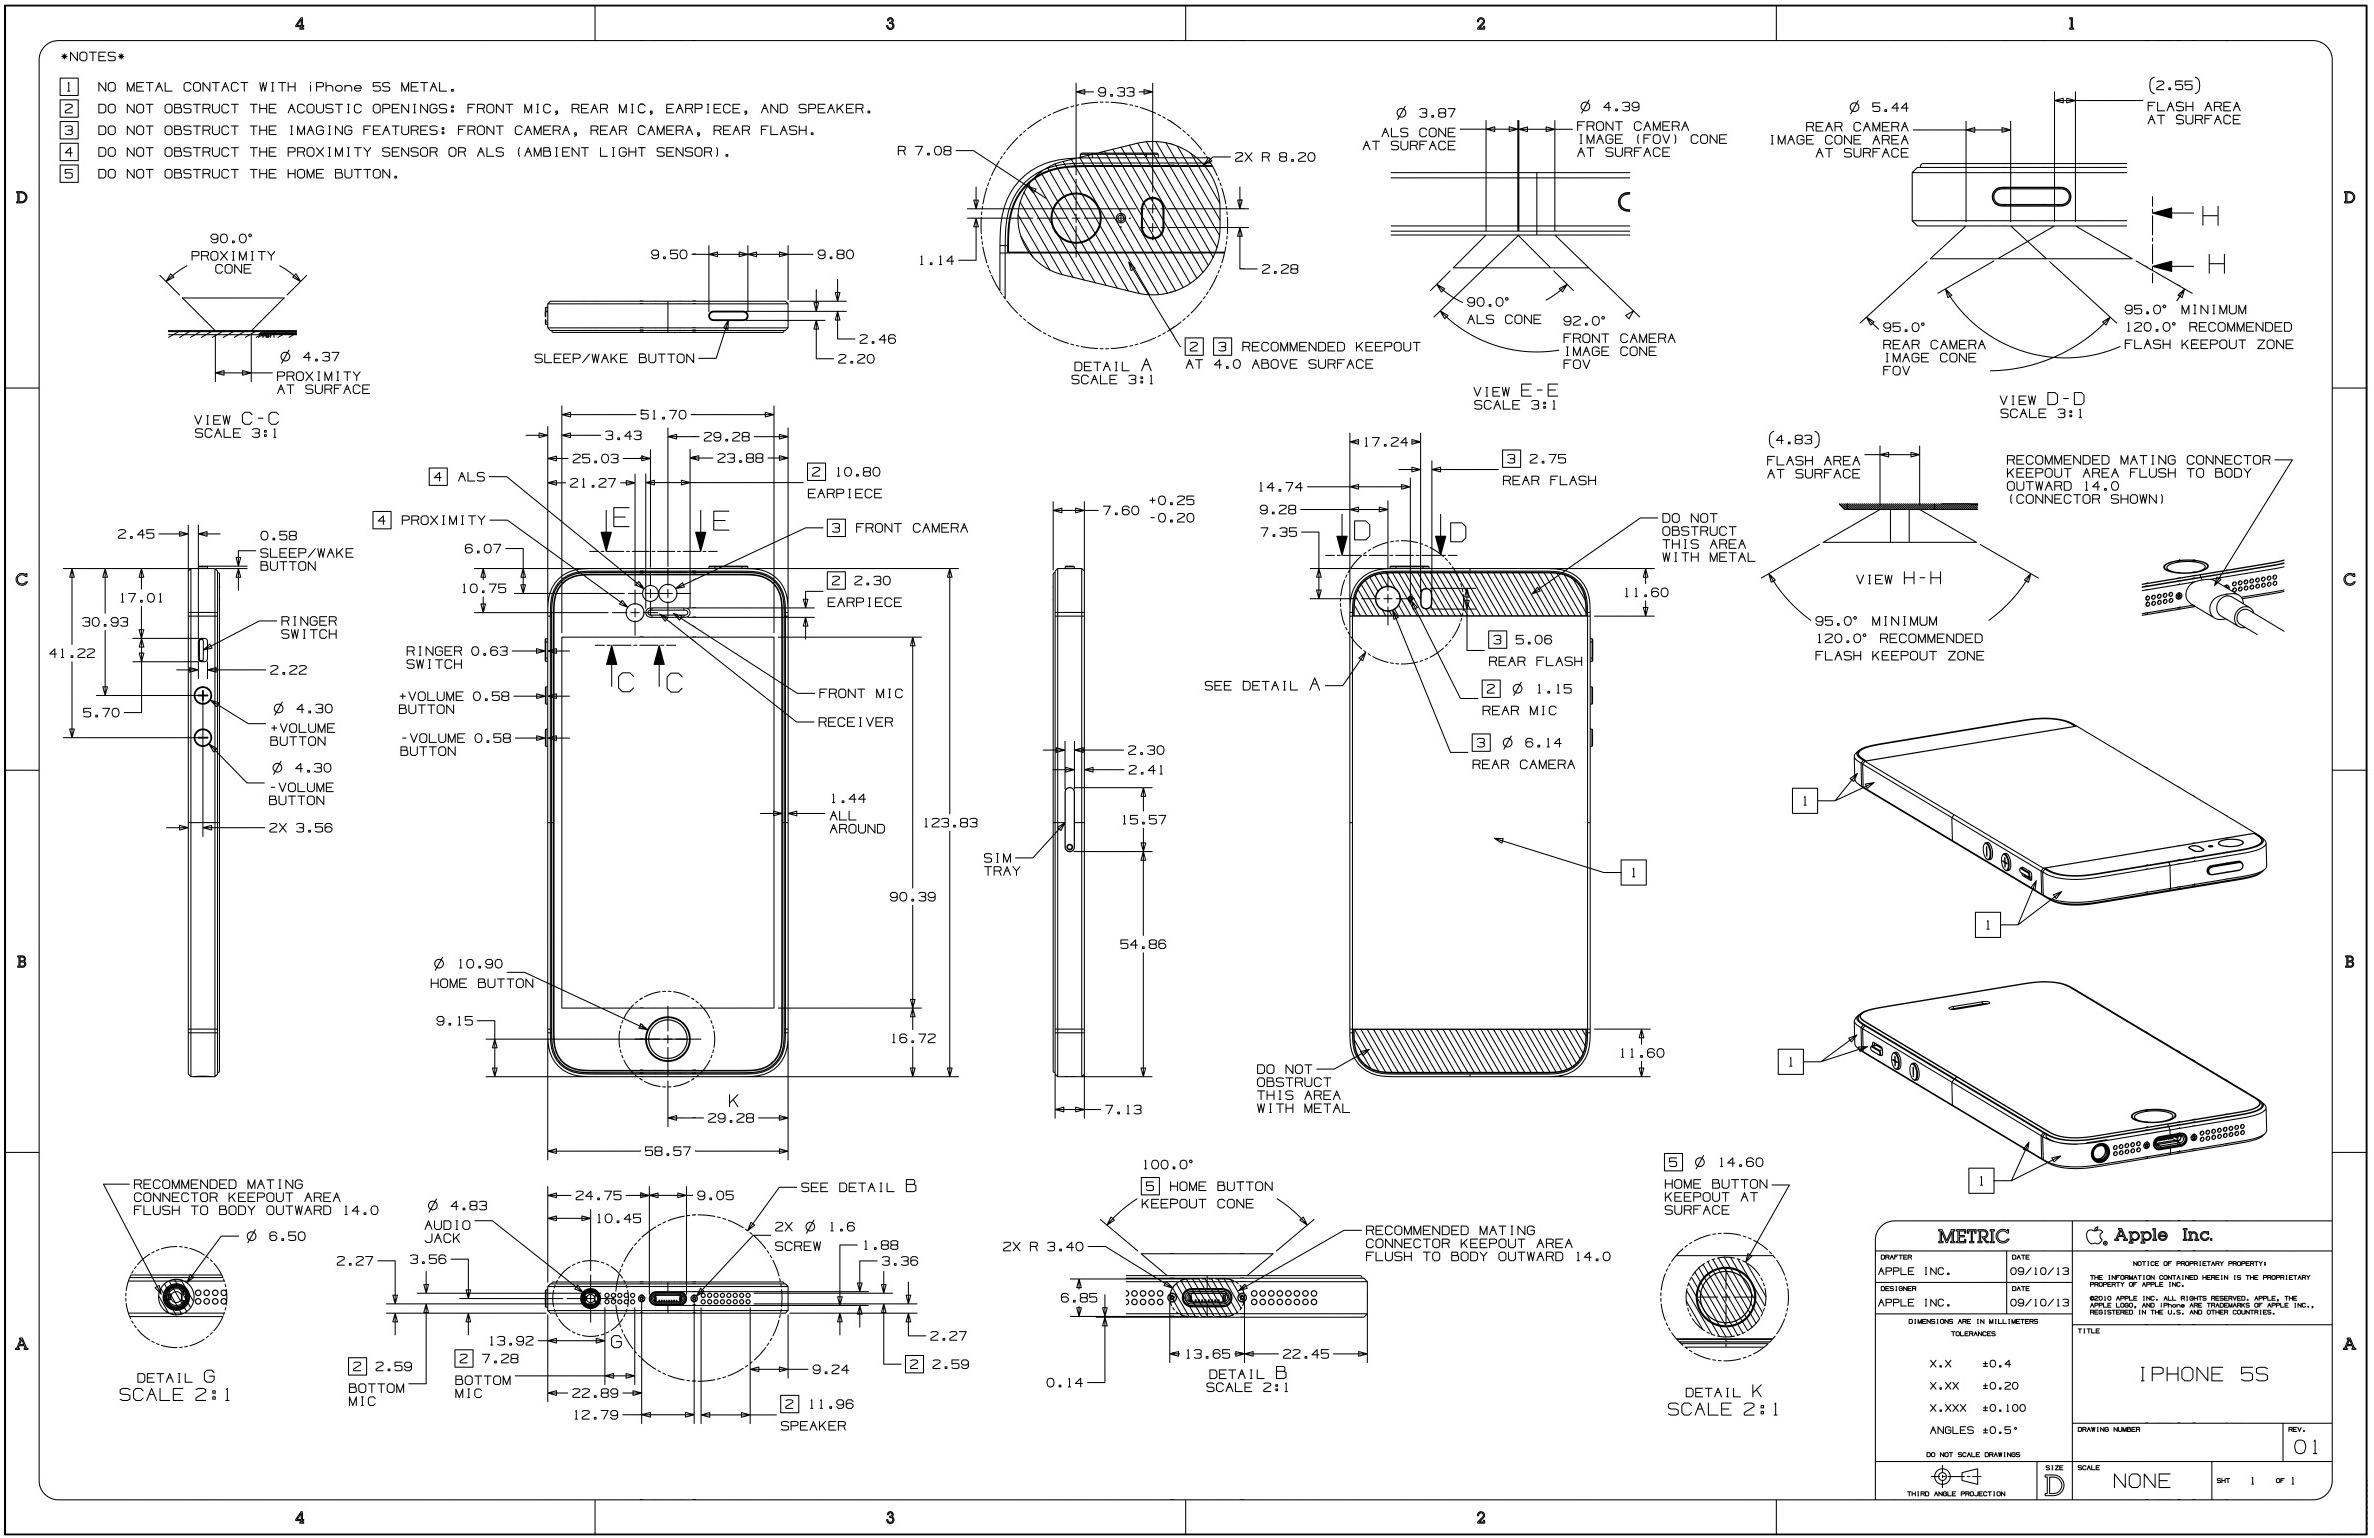 iPhone 5s schematics (image 001)